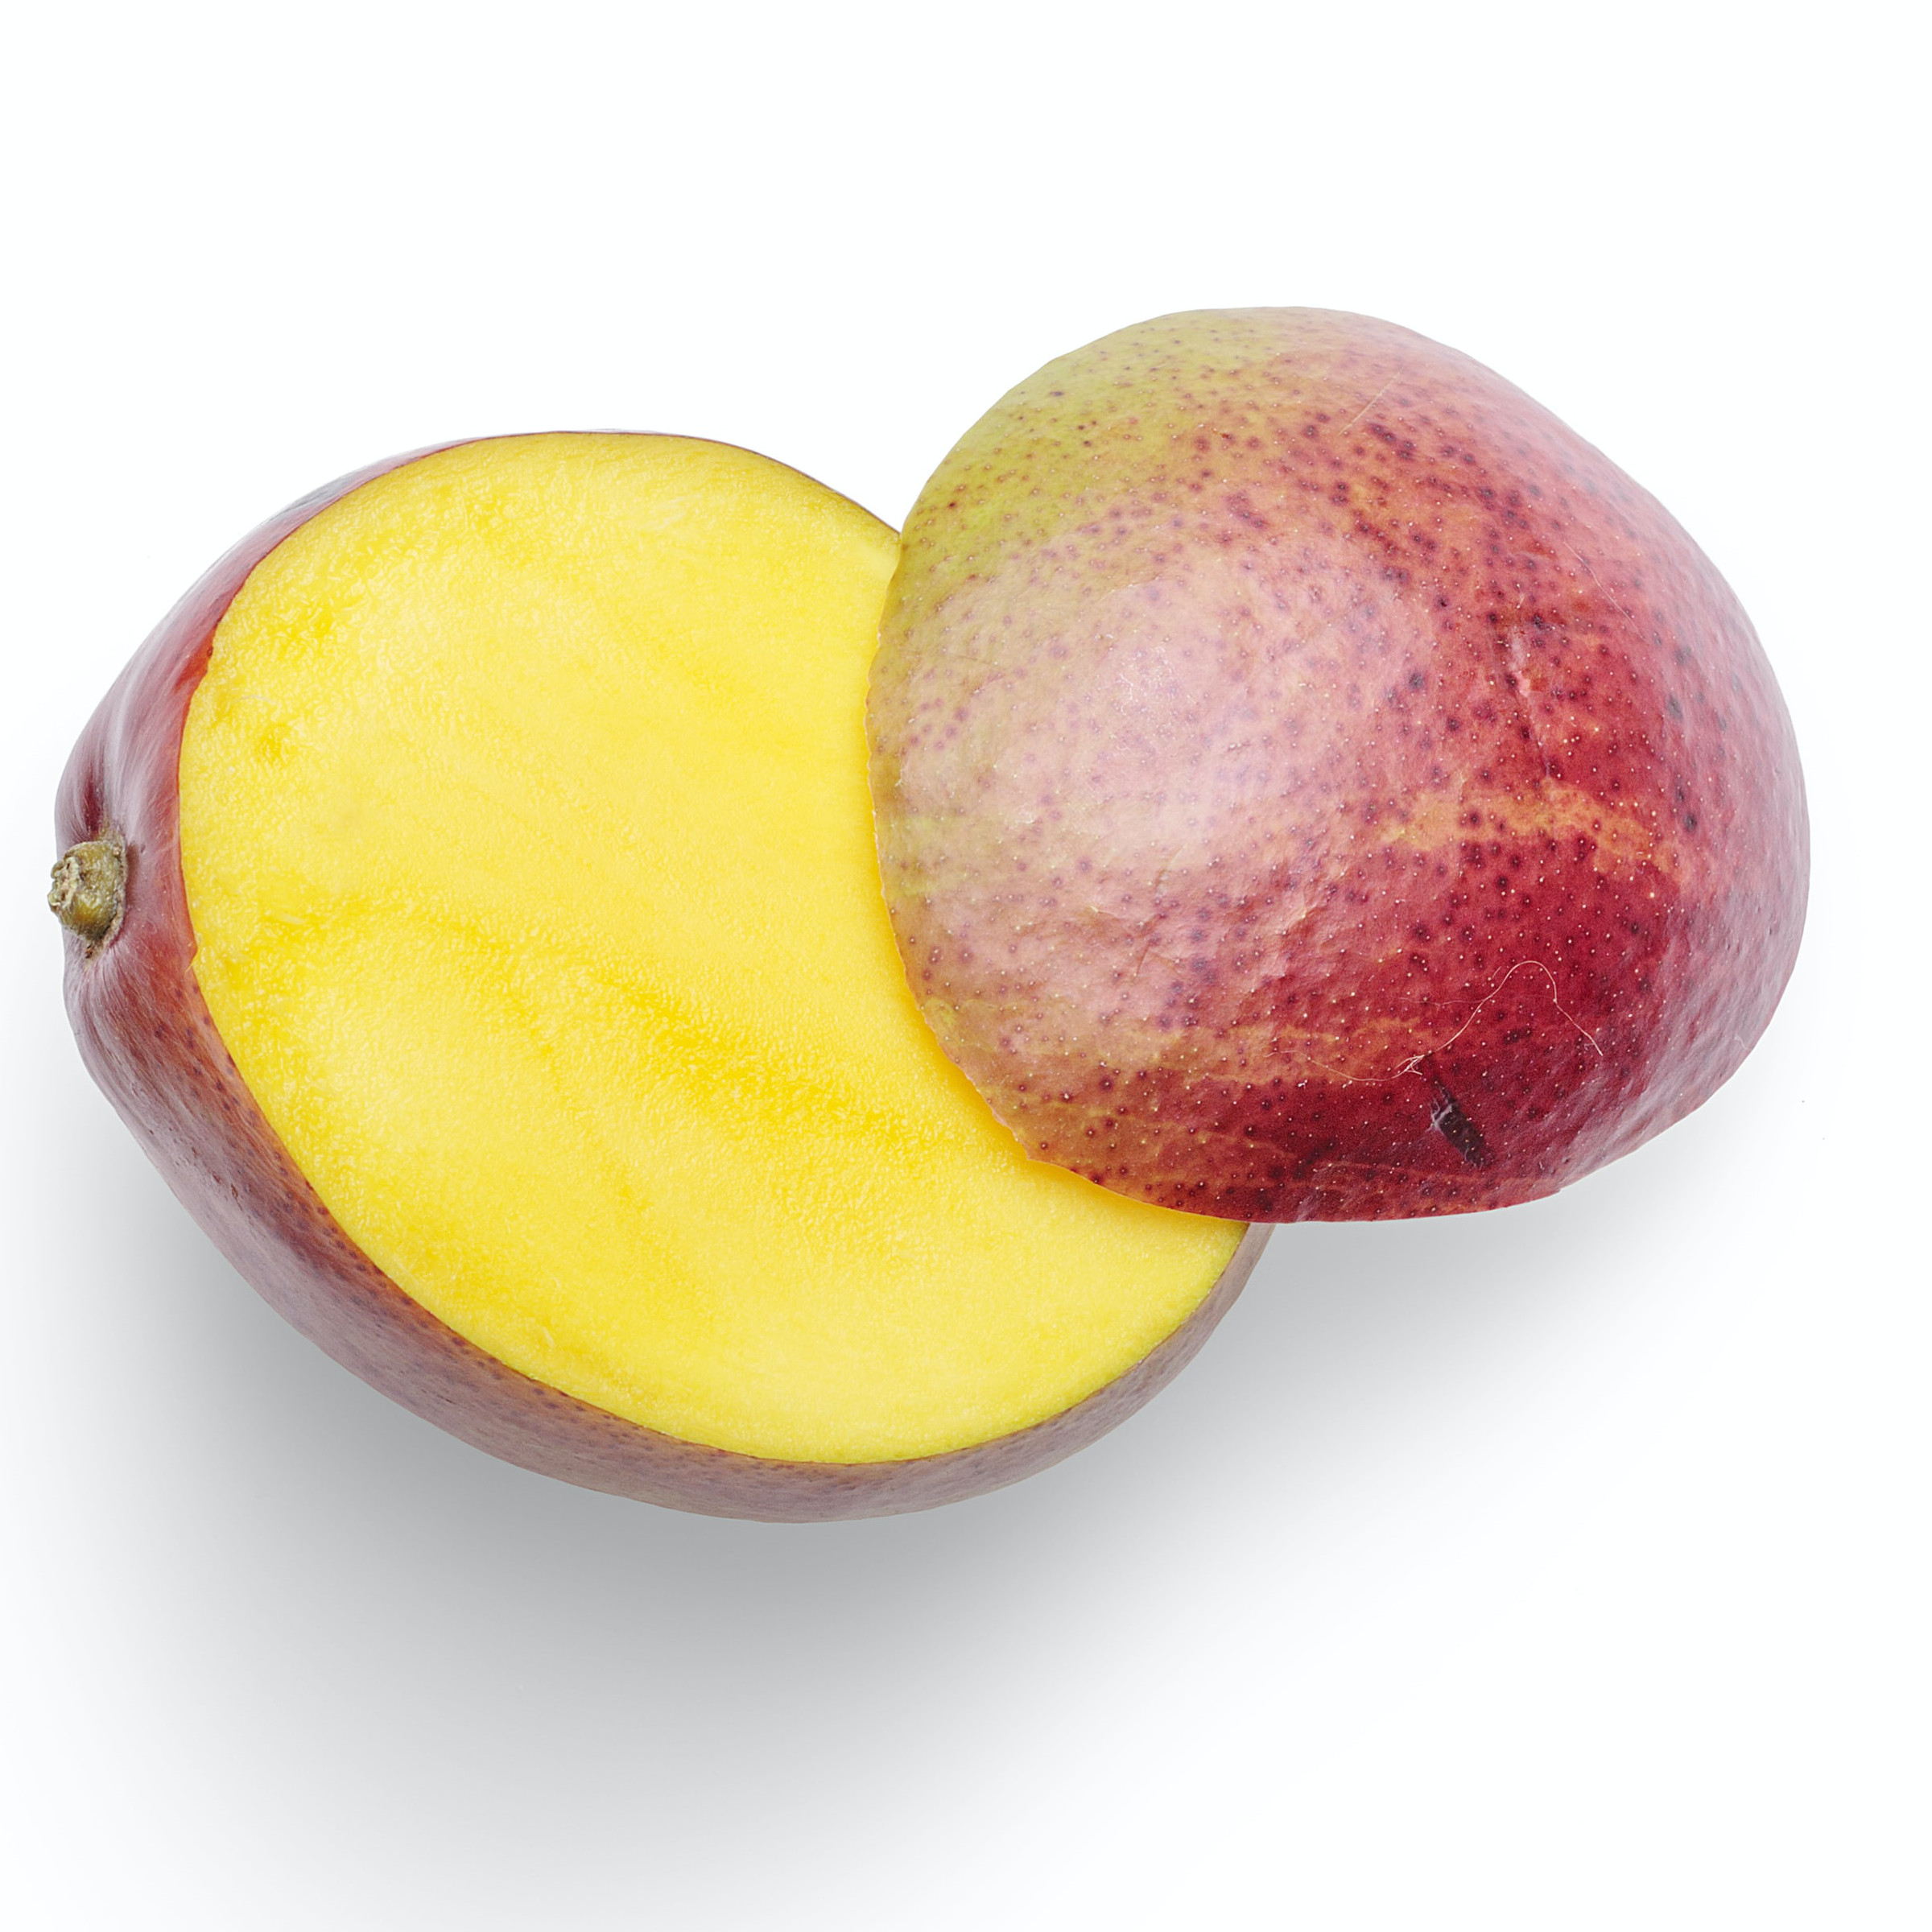 Mango variedad Osteen